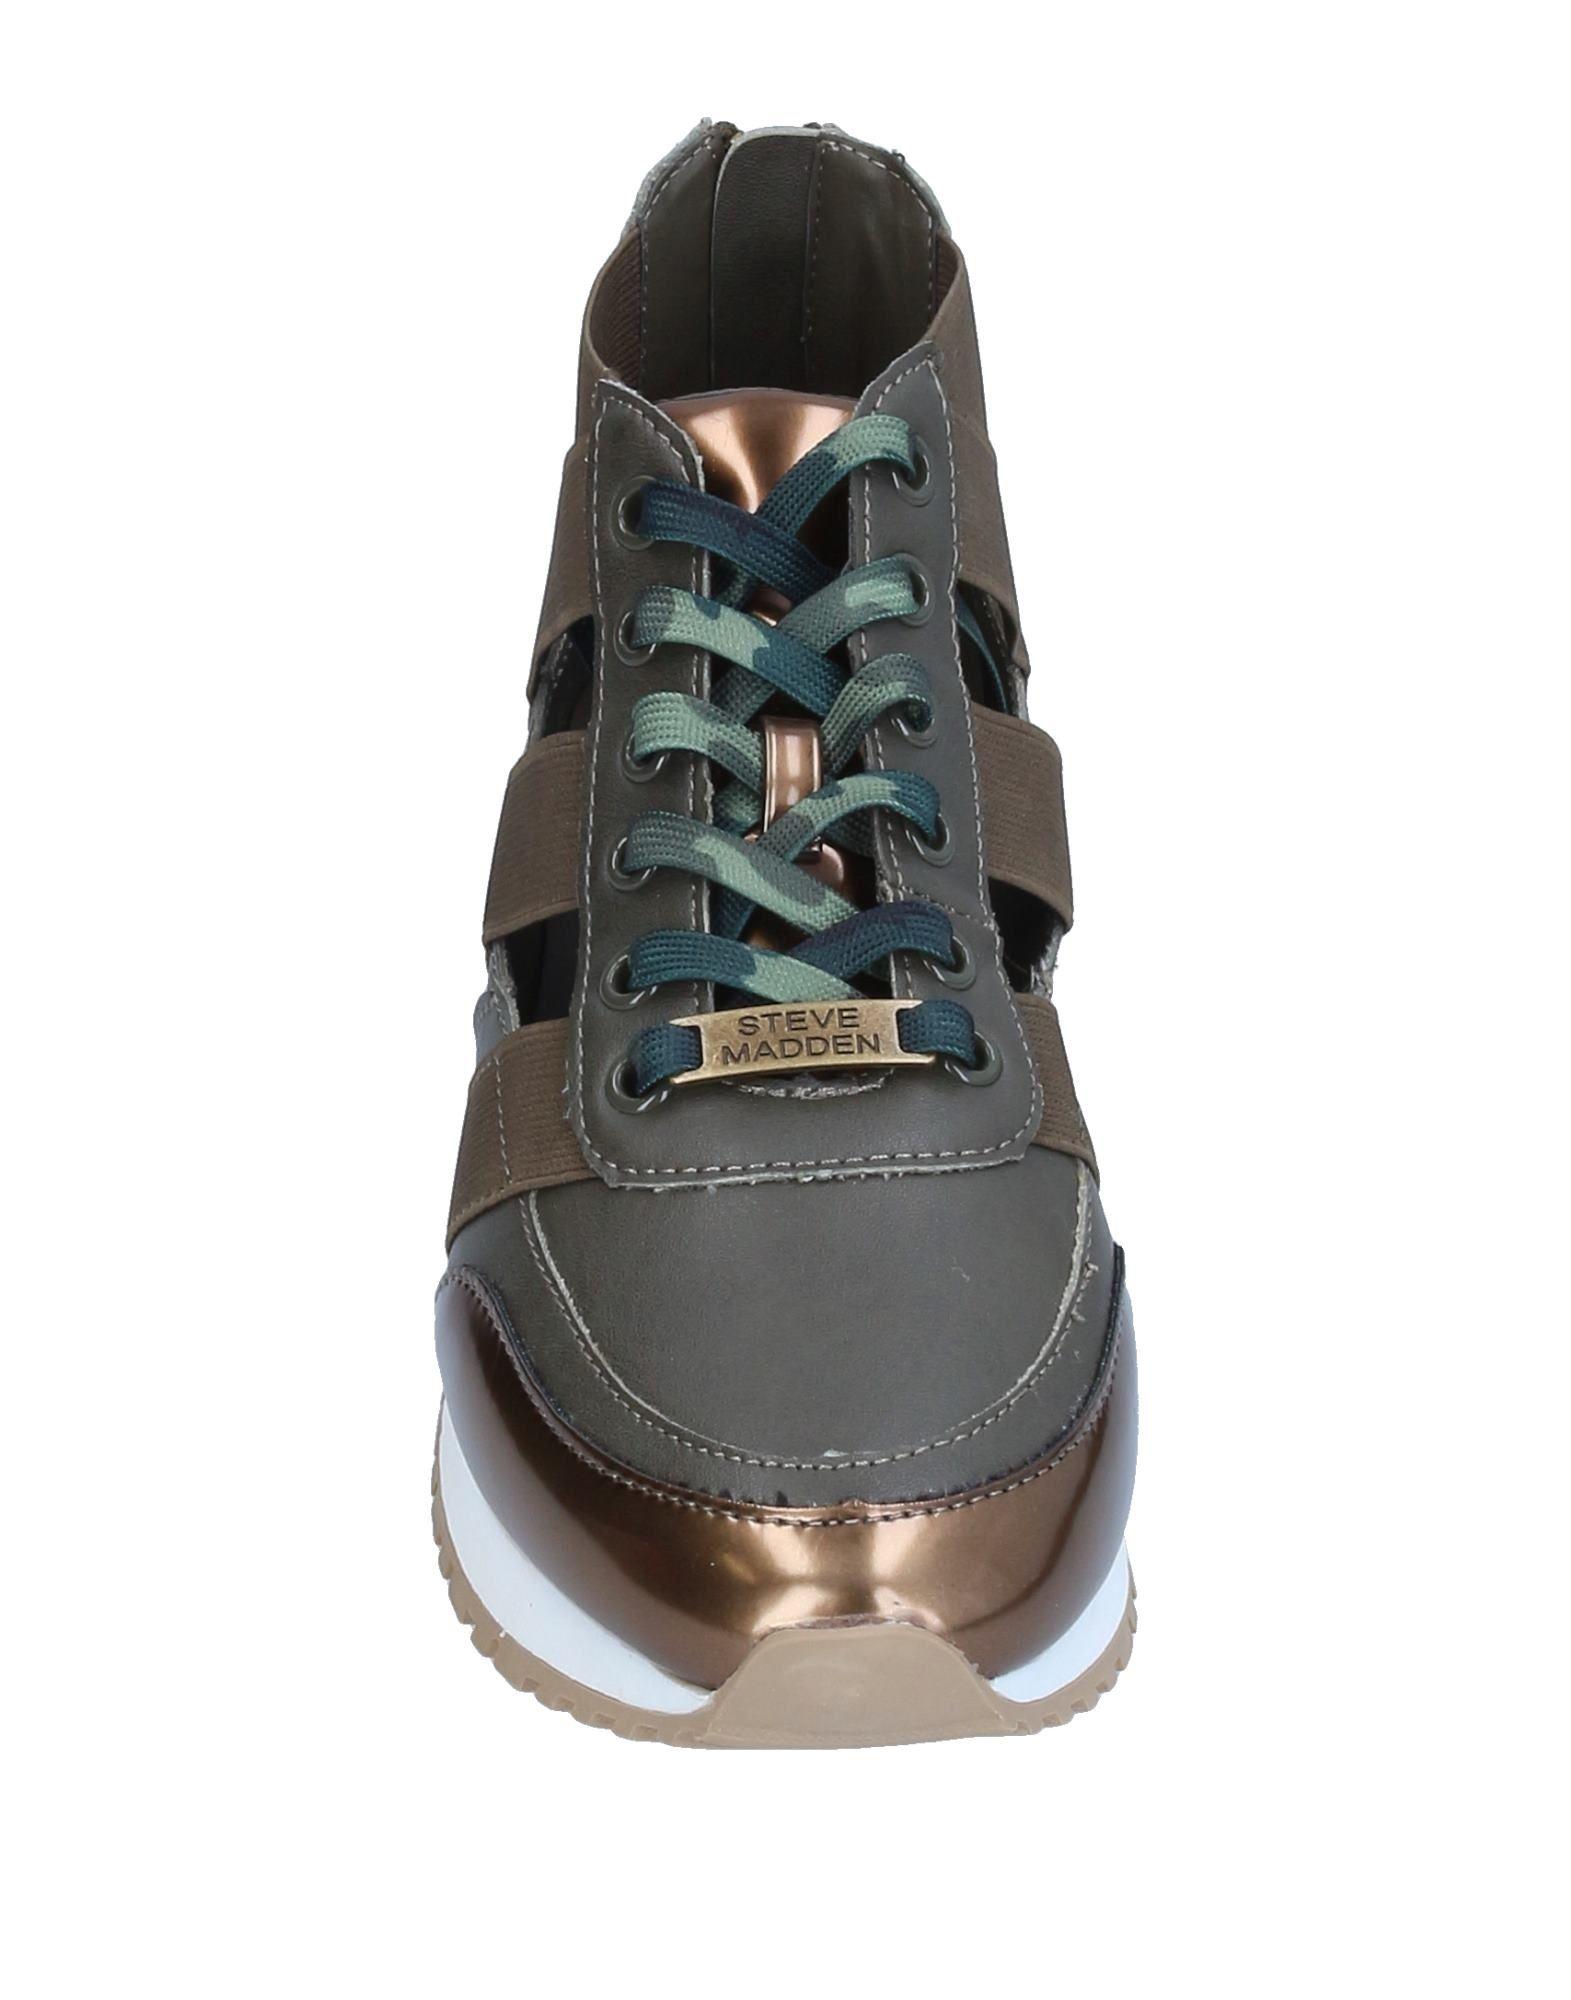 Sneakers Steve Steve Sneakers Madden Donna - 11342532LF d96503